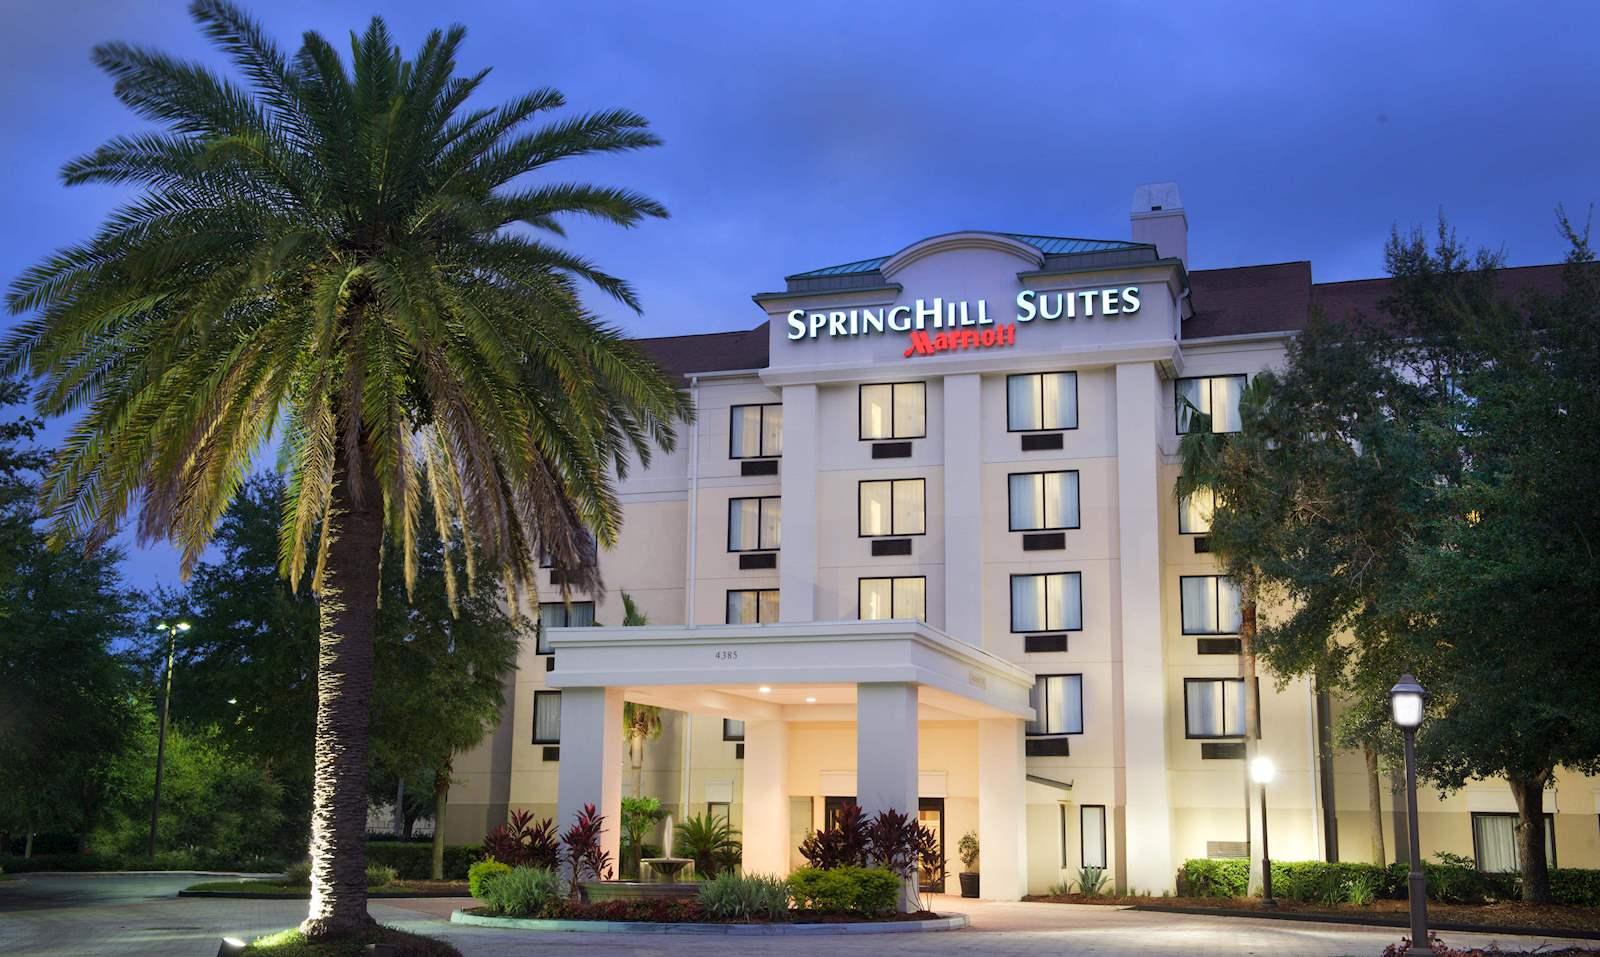 jacksonville springhill suites jss